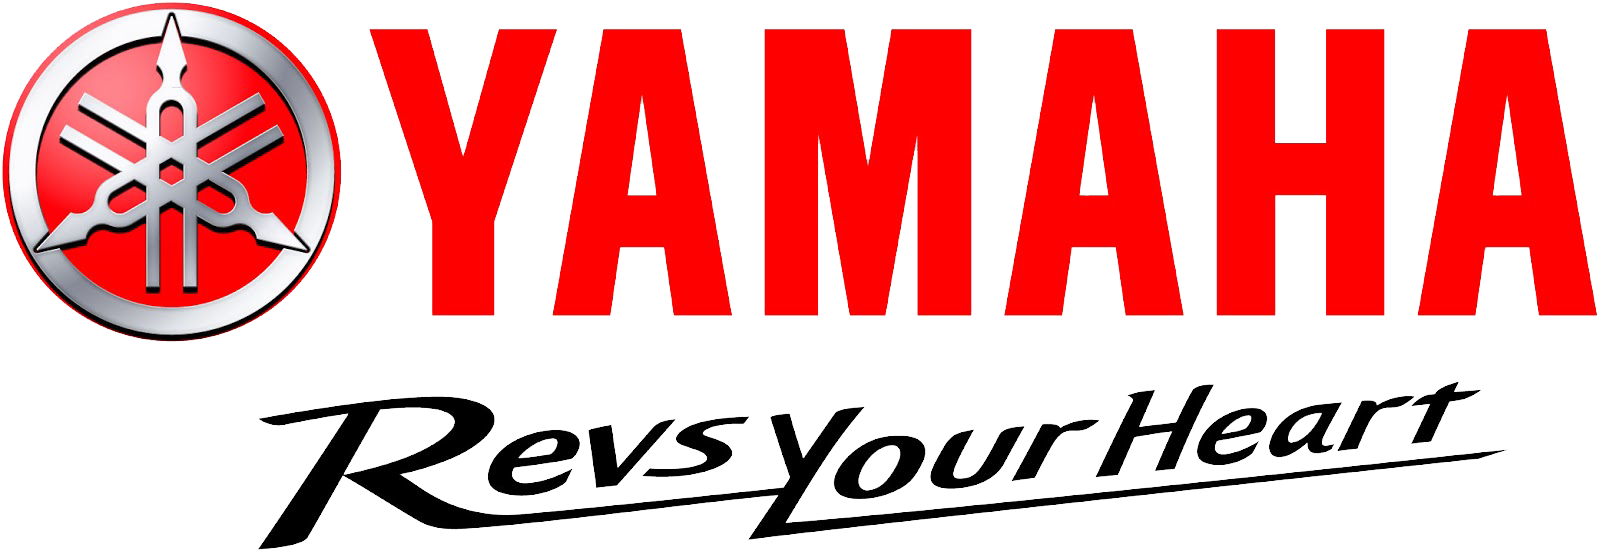 2013_YamahaLogomark-Slogan-3d-red-RGB_En2.png